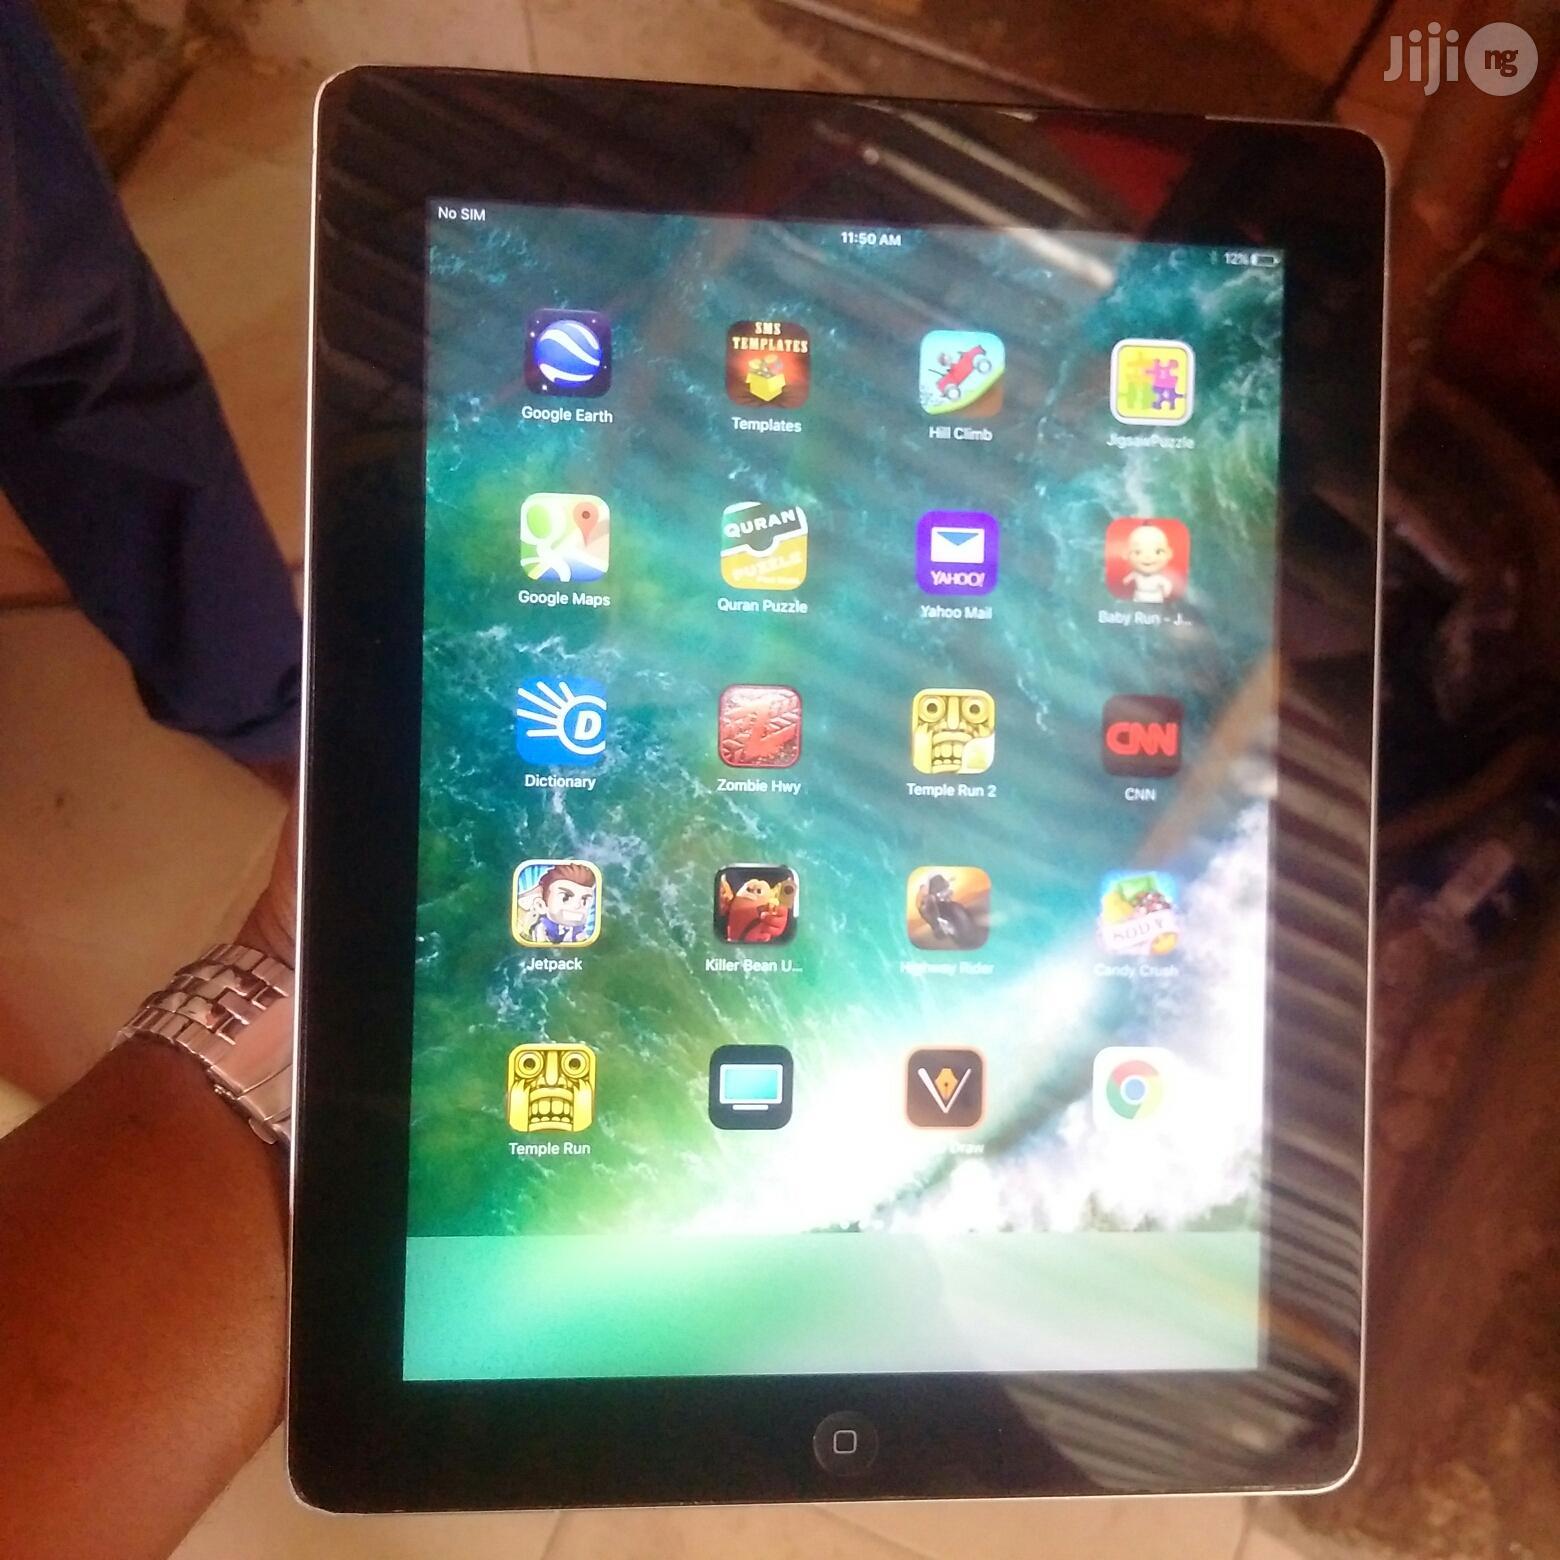 Apple iPad 4 Wi-Fi Cellular 16 GB